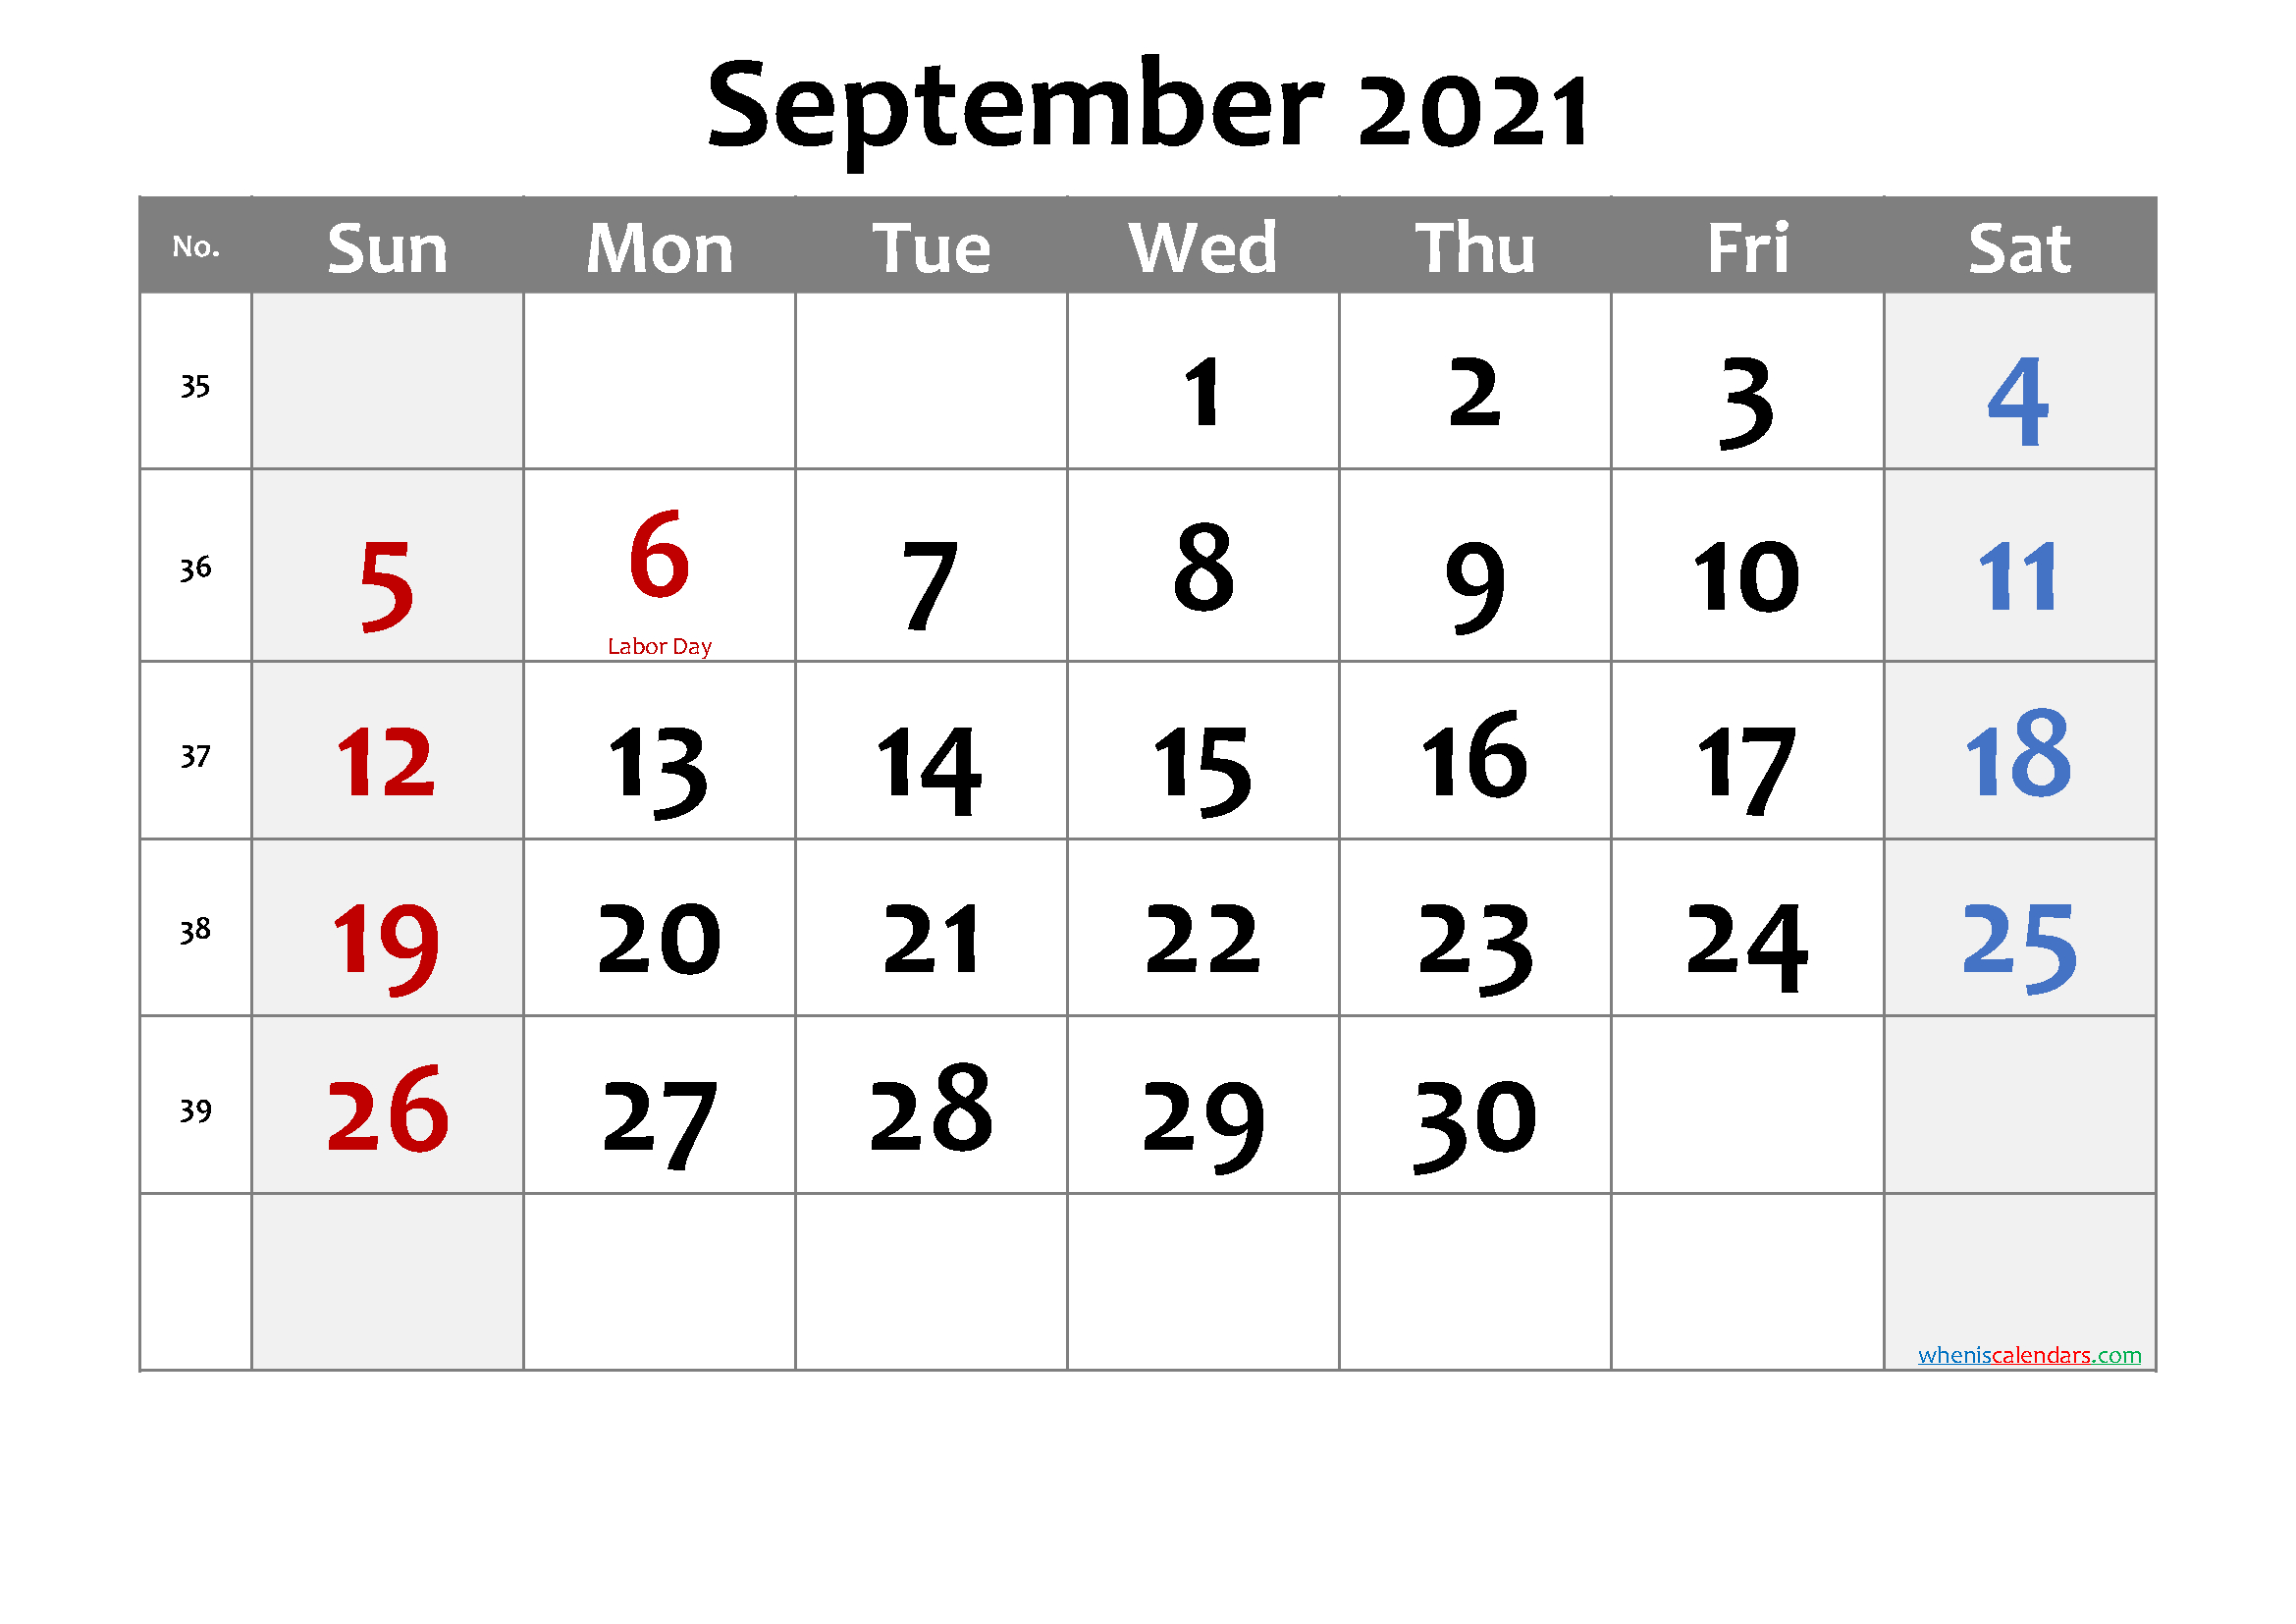 Editable September 2021 Calendartemplate No.cd21M21 within 3 Month Printable Calendar Templates 2021 Sept